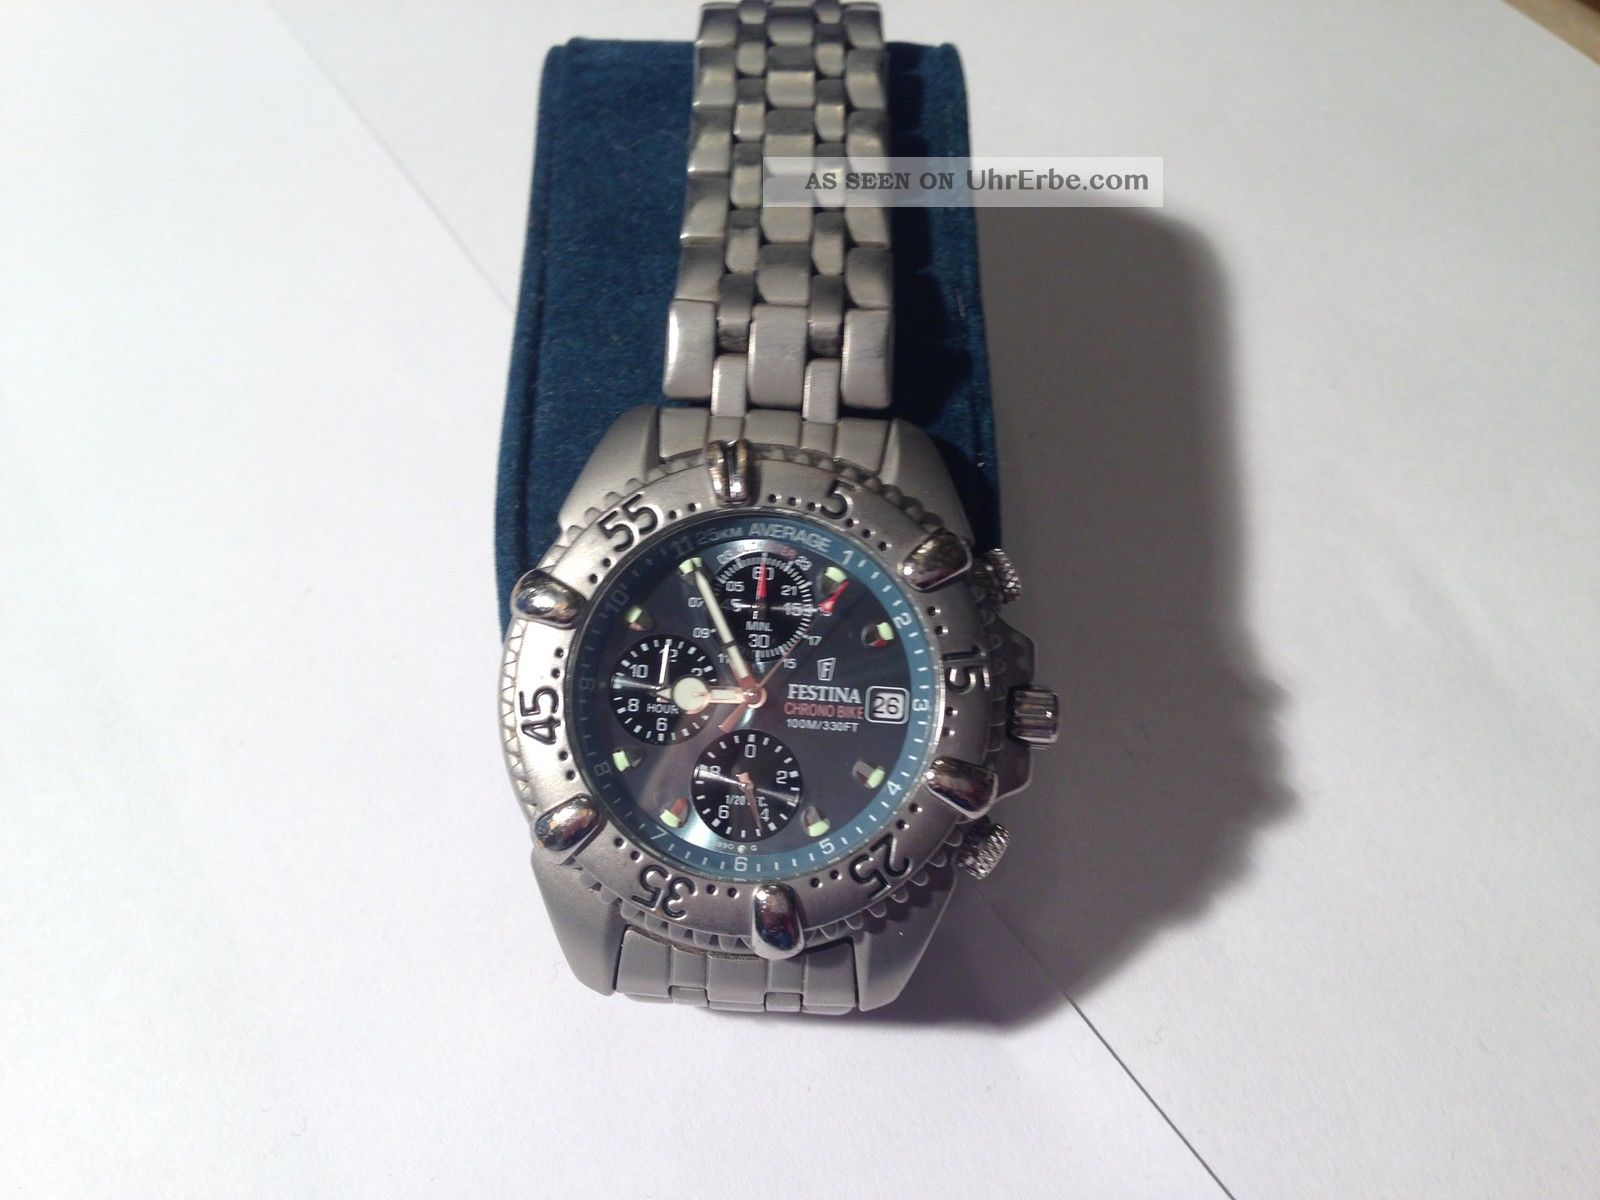 Chrono Chrono Armband Armband Uhr330ft Uhr330ft Festina Herren Festina Herren WxBordeQC